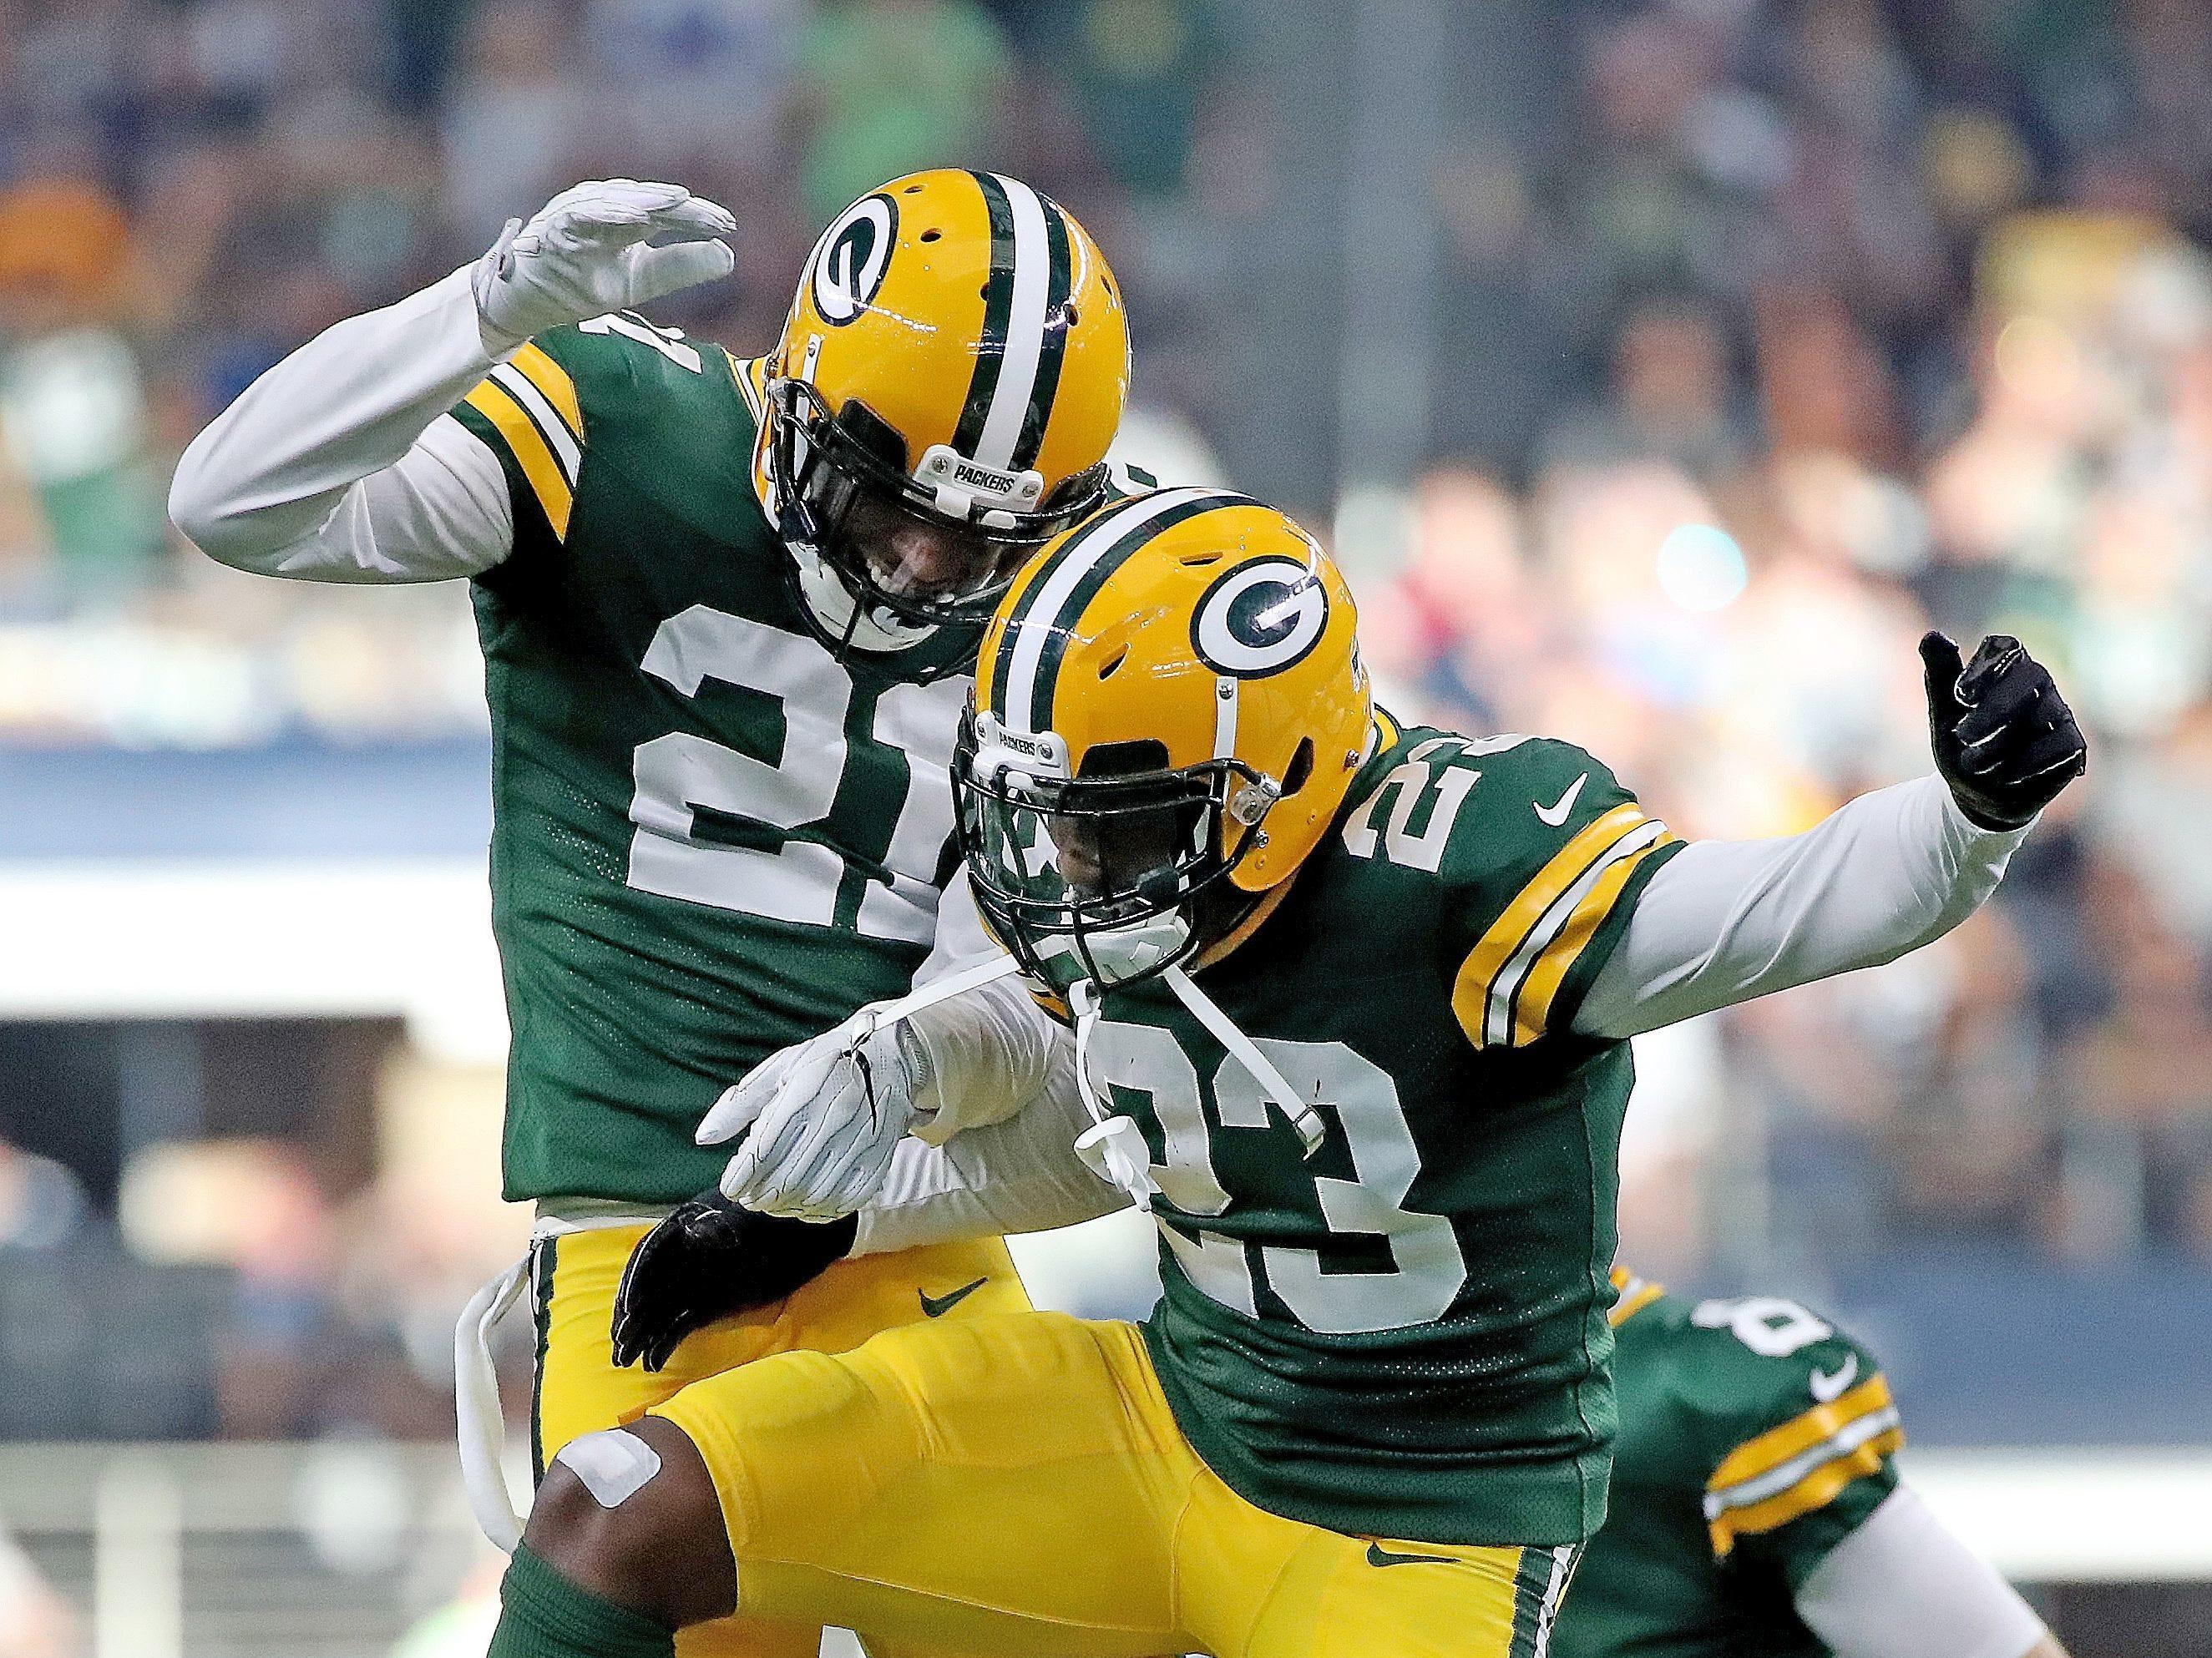 Green Bay Packers cornerback Damarious Randall (23) and free safety Ha Ha Clinton-Dix (21) celebrates Randall's pick six against the Dallas Cowboys Sunday, October 8, 2017 at AT&T Stadium in Arlington, Tx.